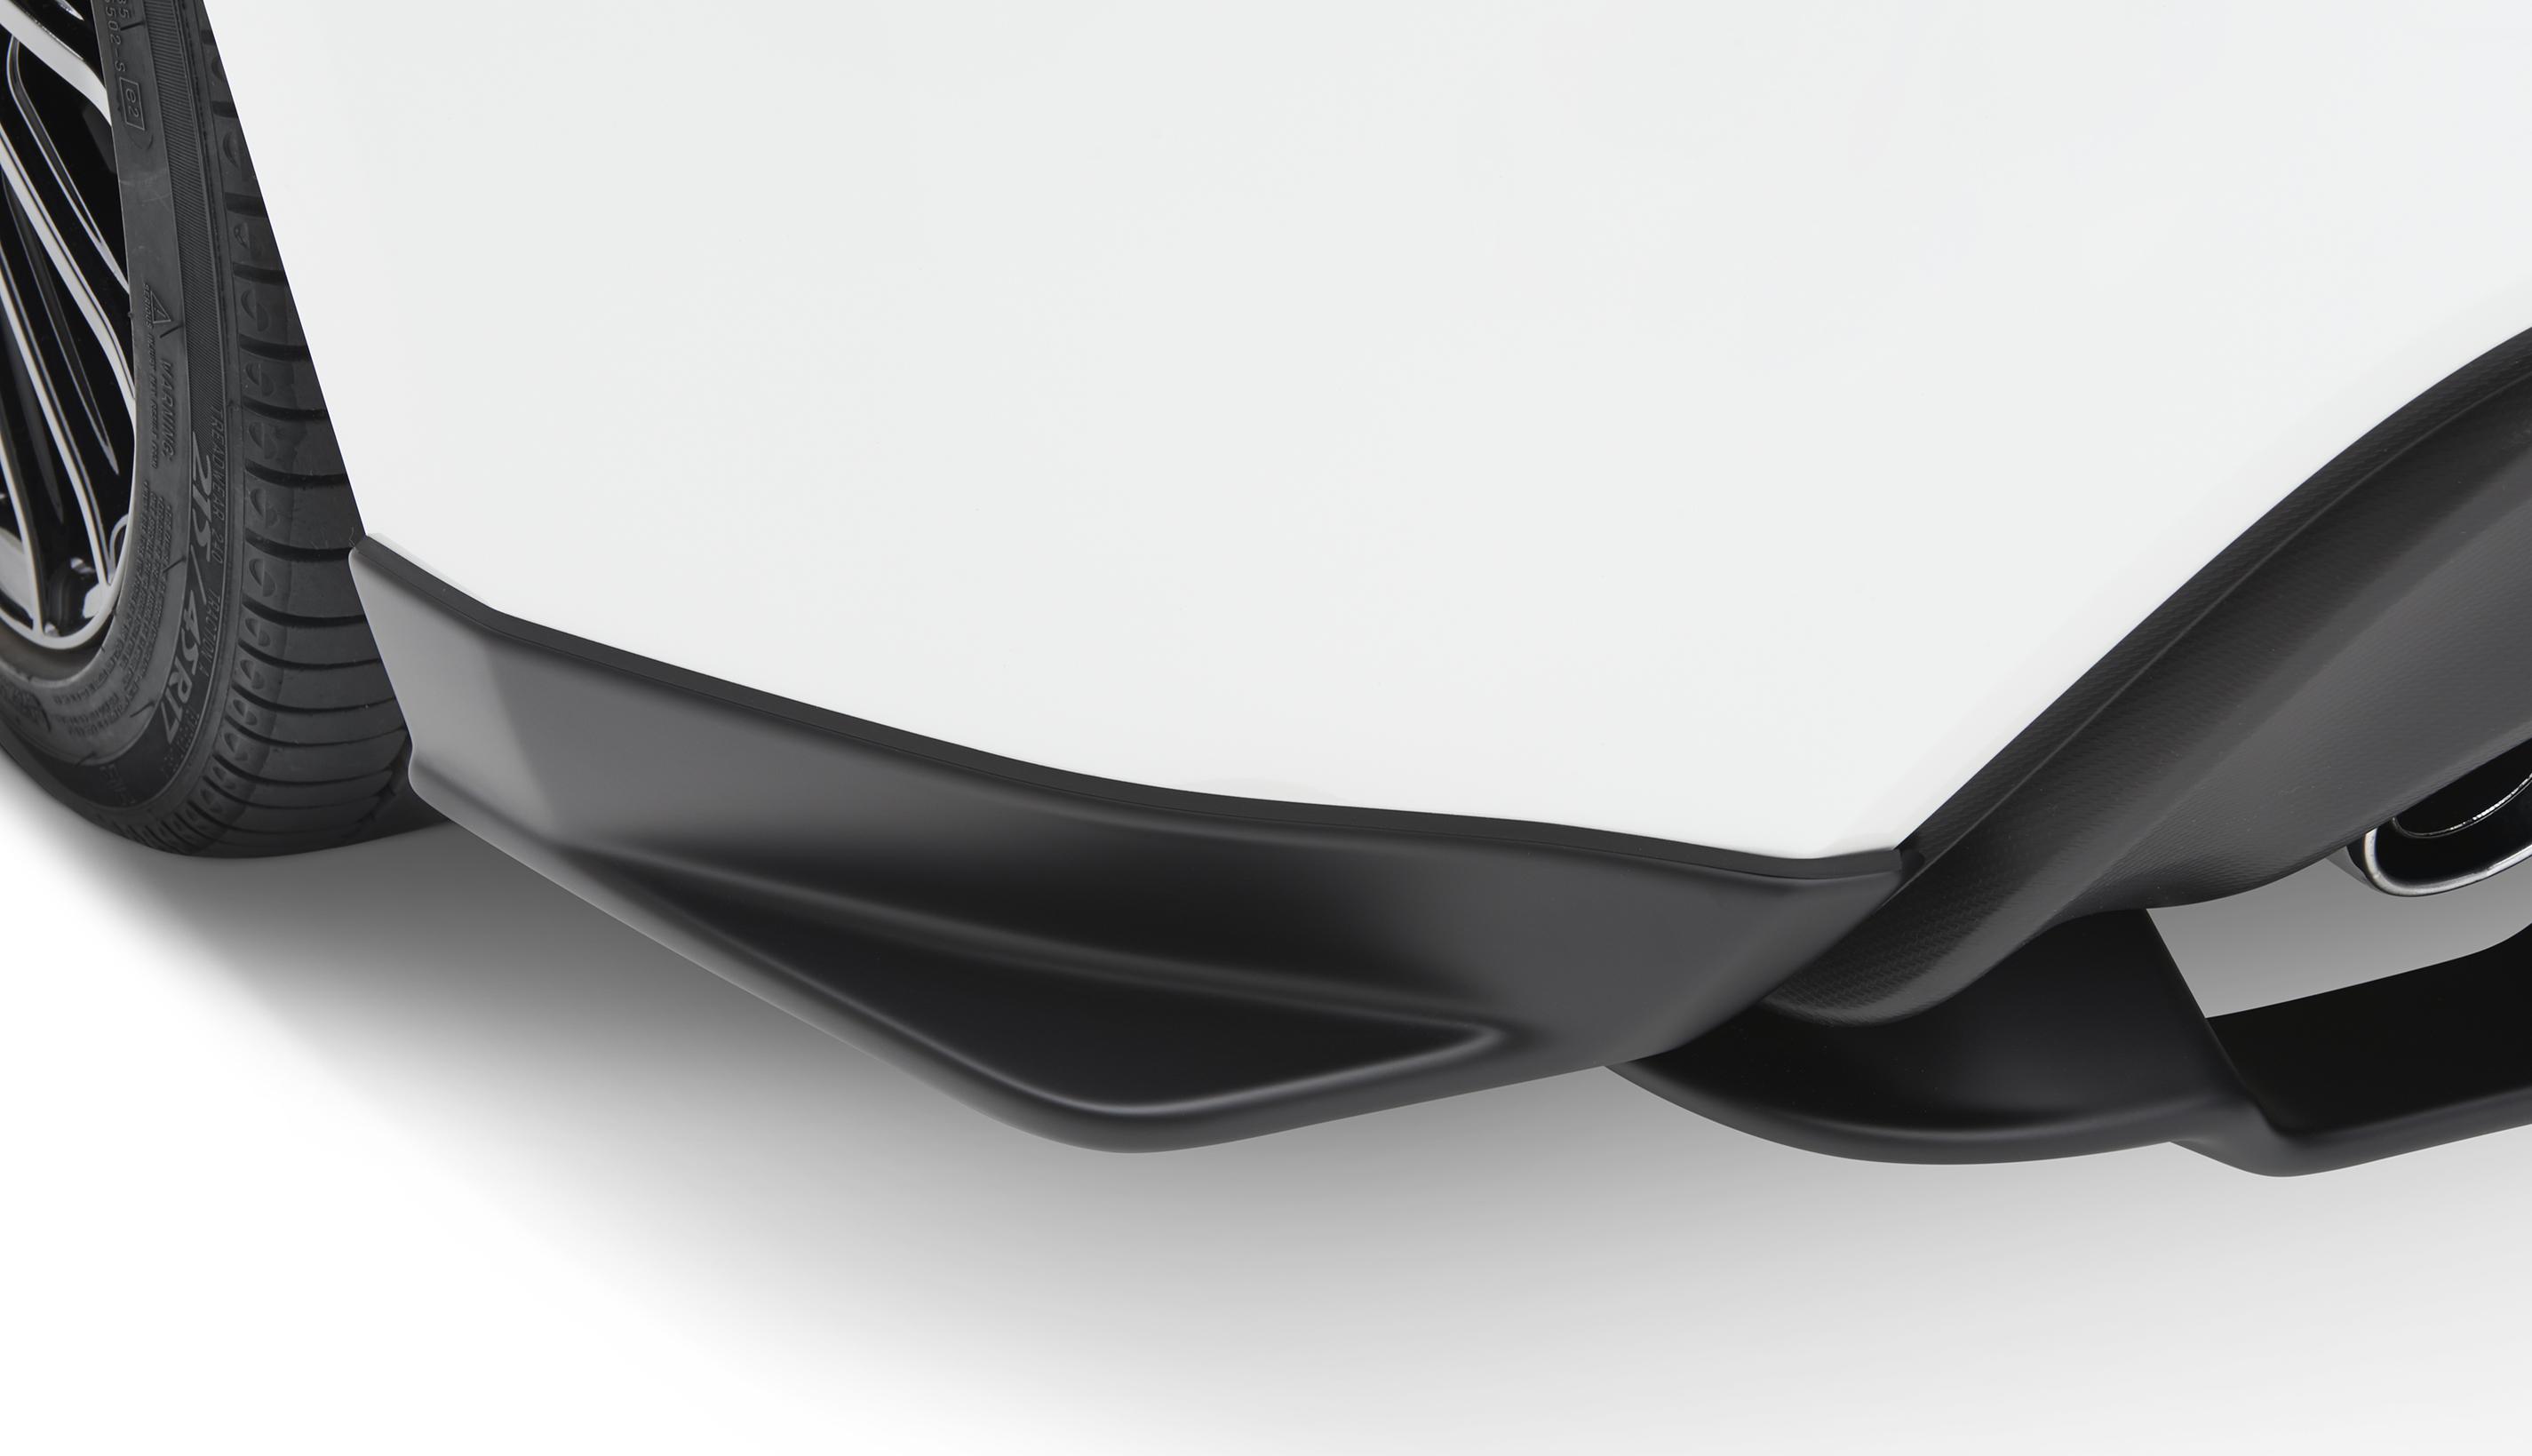 2013 Subaru Brz Sti Under Spoiler Rear Quarter Side